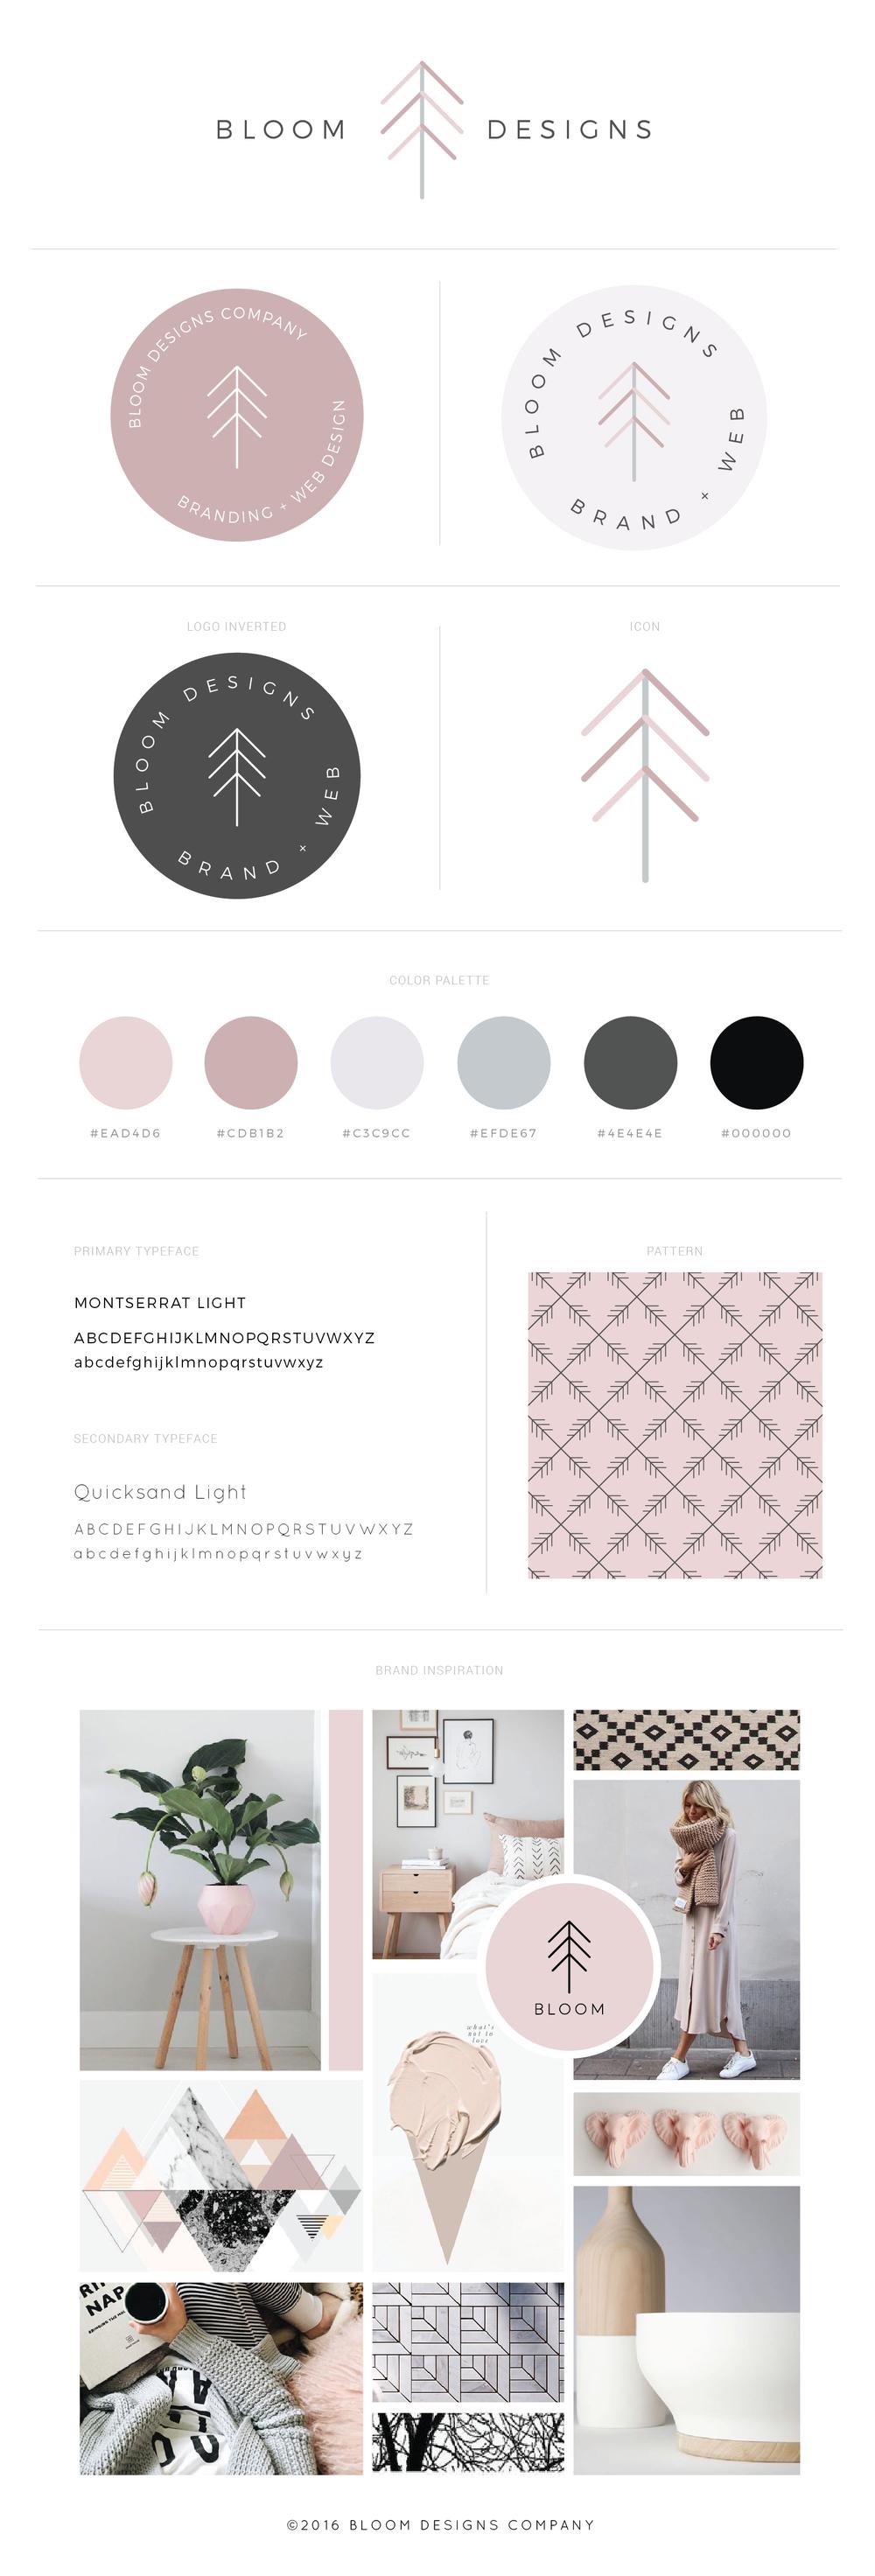 bloom designs company brand identity and website design board